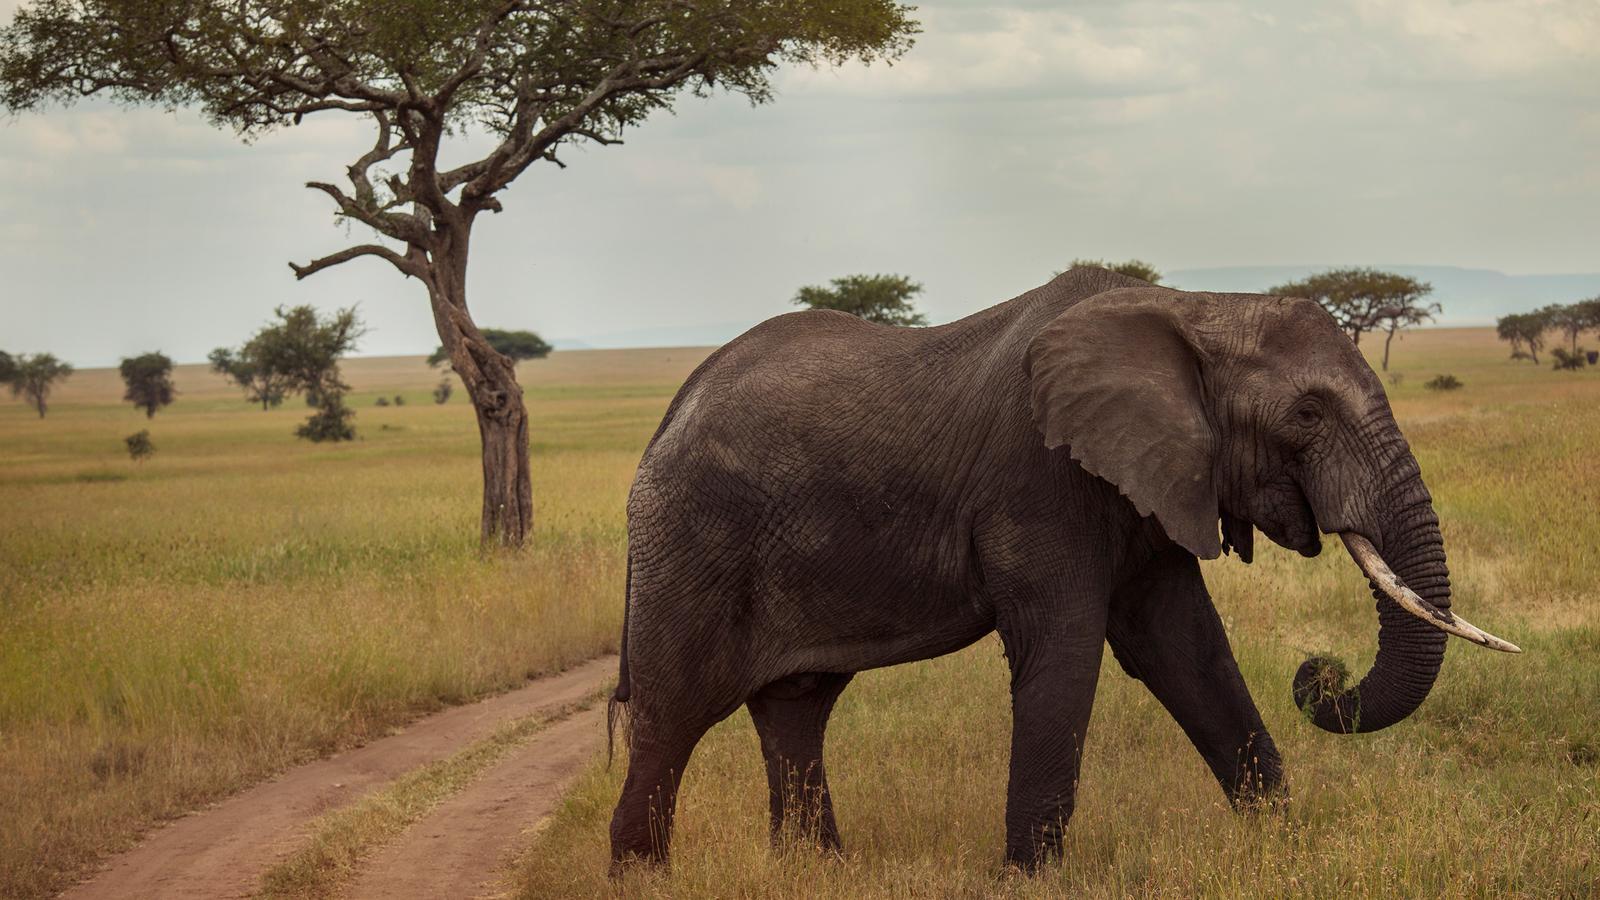 Afrika Reisen für junge Leute traveljunkies Kenia Malawi Tansania Sambia Simbabwe Safari Gruppenreise Abenteuerreise Erlebnisreise Serengeti Ngorongoro Sansibar Victoriafälle